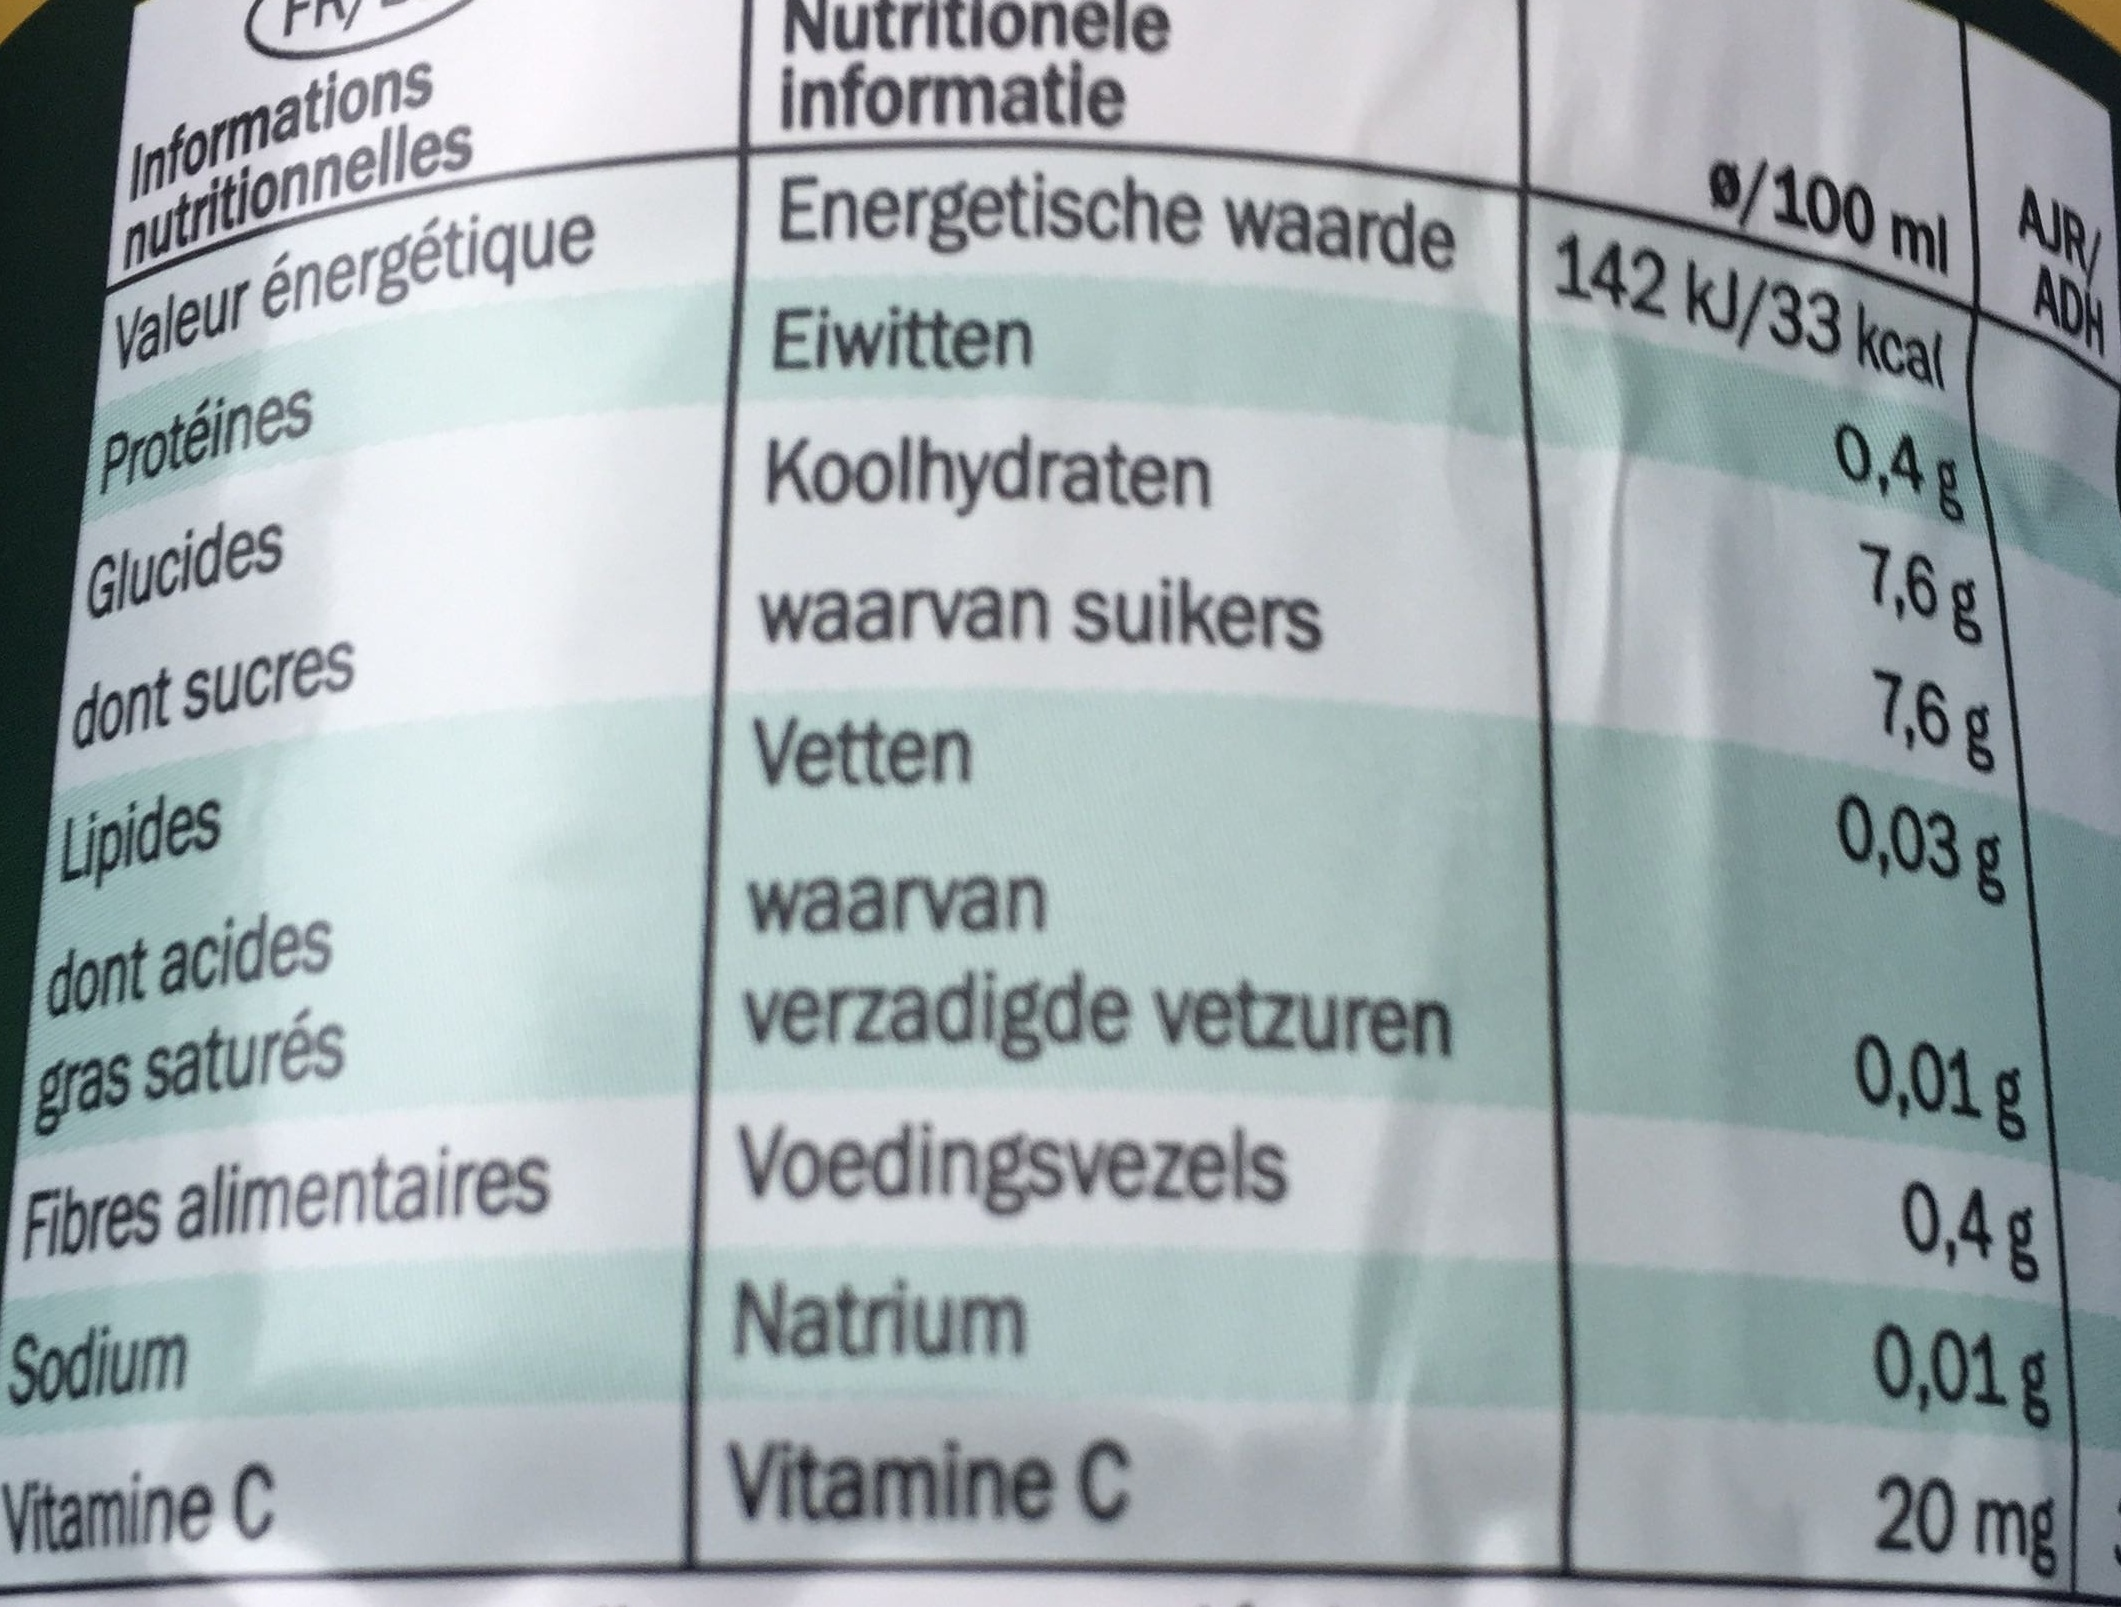 Nectar d'orange - Informations nutritionnelles